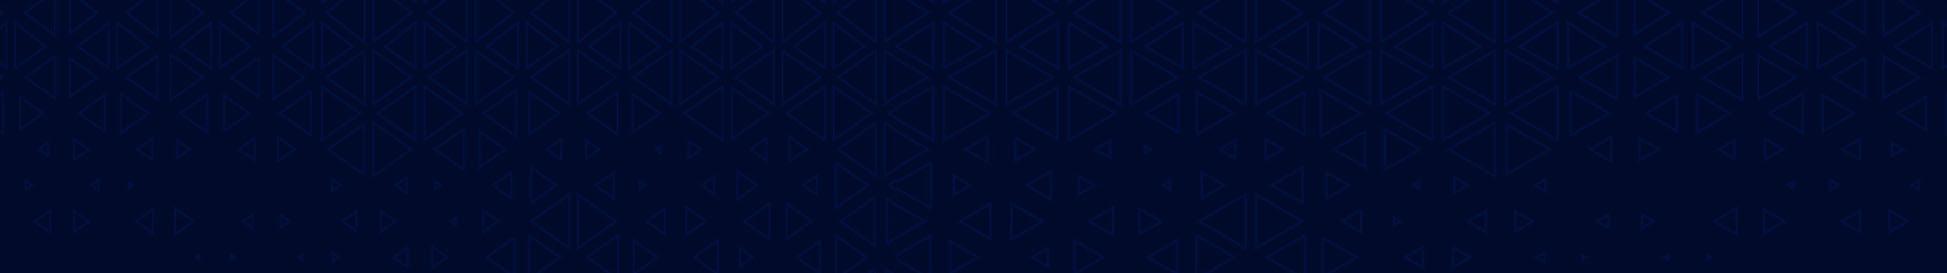 https://thicongepoxyjoton.vn/wp-content/uploads/2020/08/bannner_f.jpg